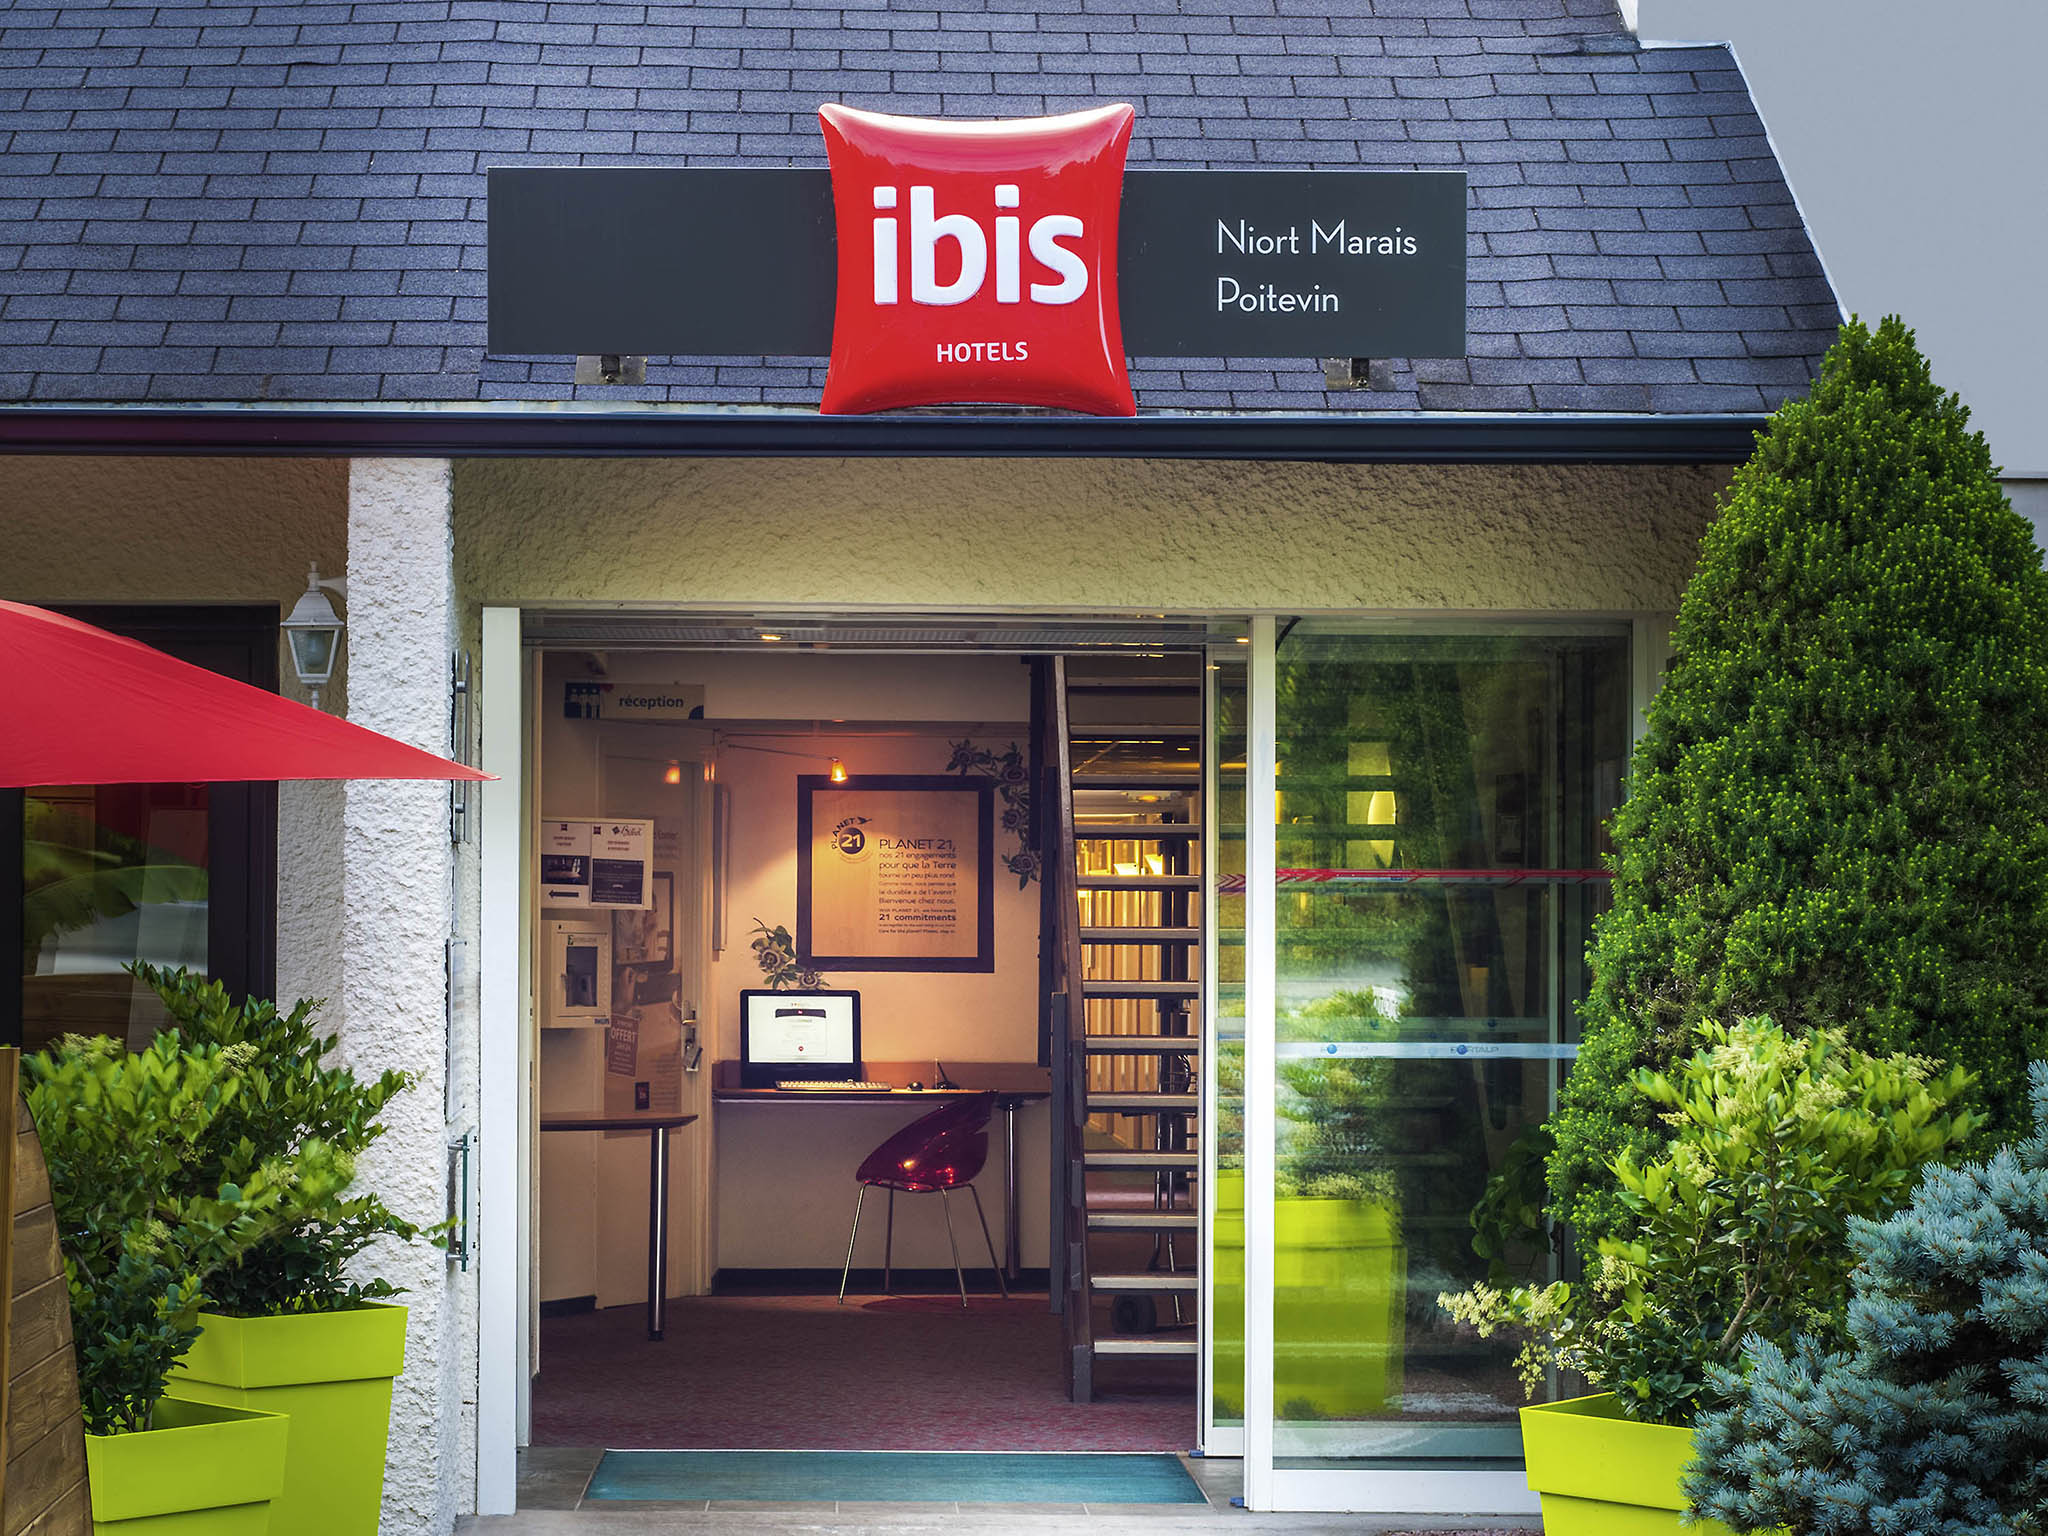 Hotel in NIORT ibis Niort Marais Poitevin